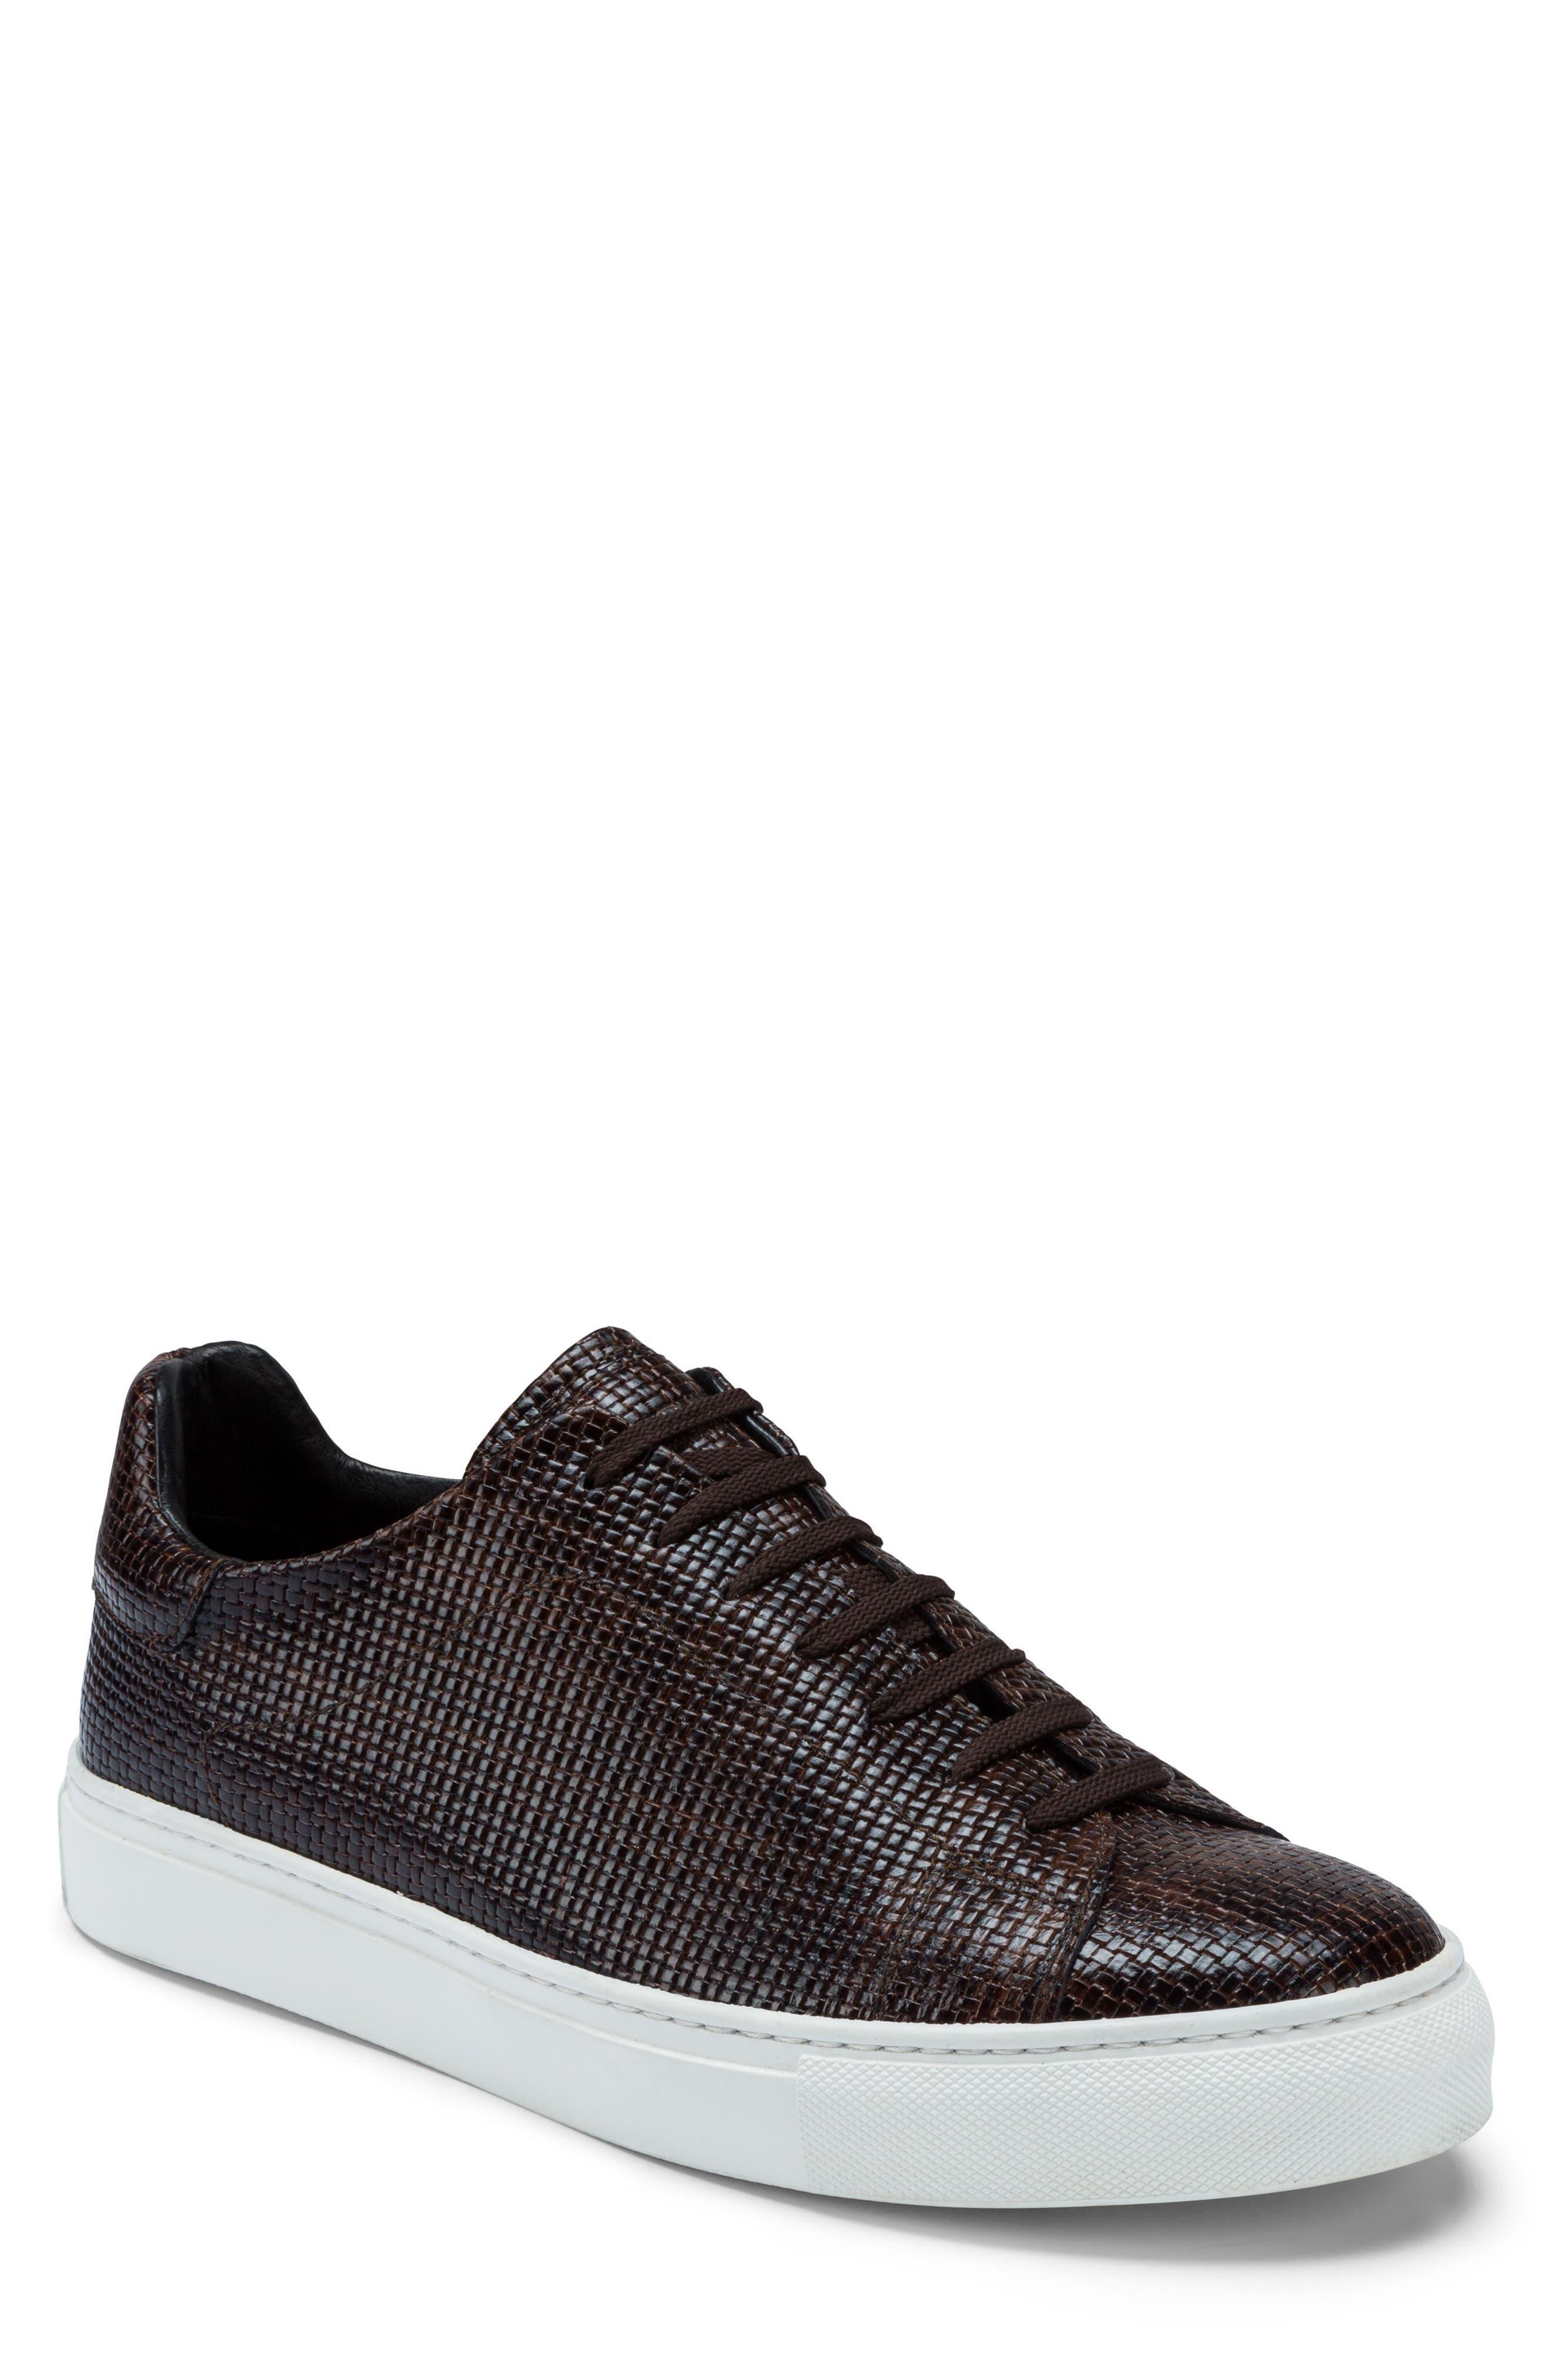 Main Image - Bugatchi Wimbledon Sneaker (Men)